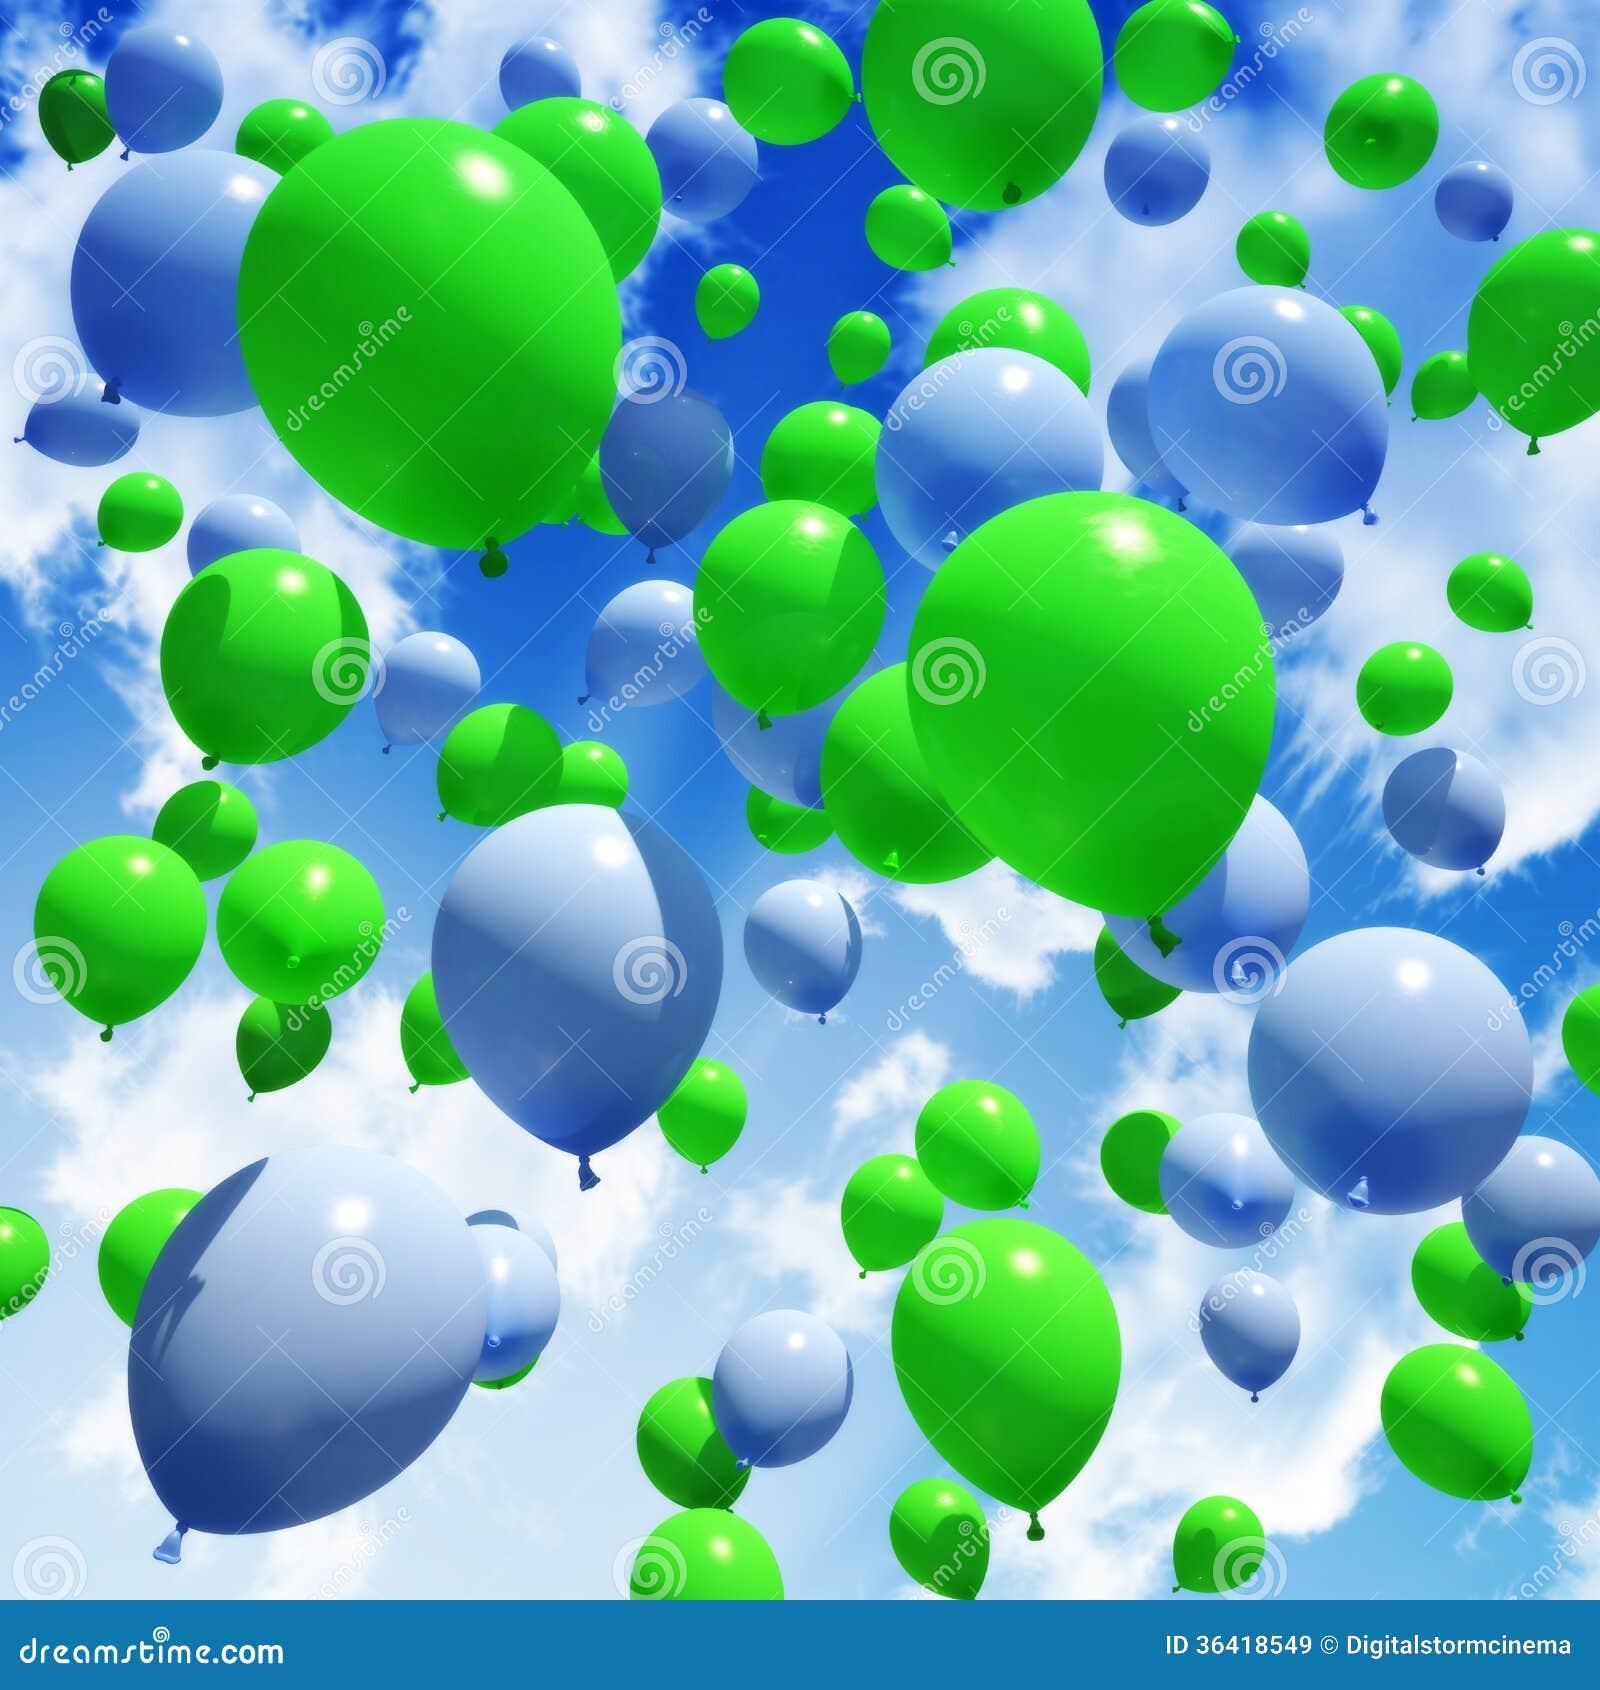 Green and blue balloons - Balloon